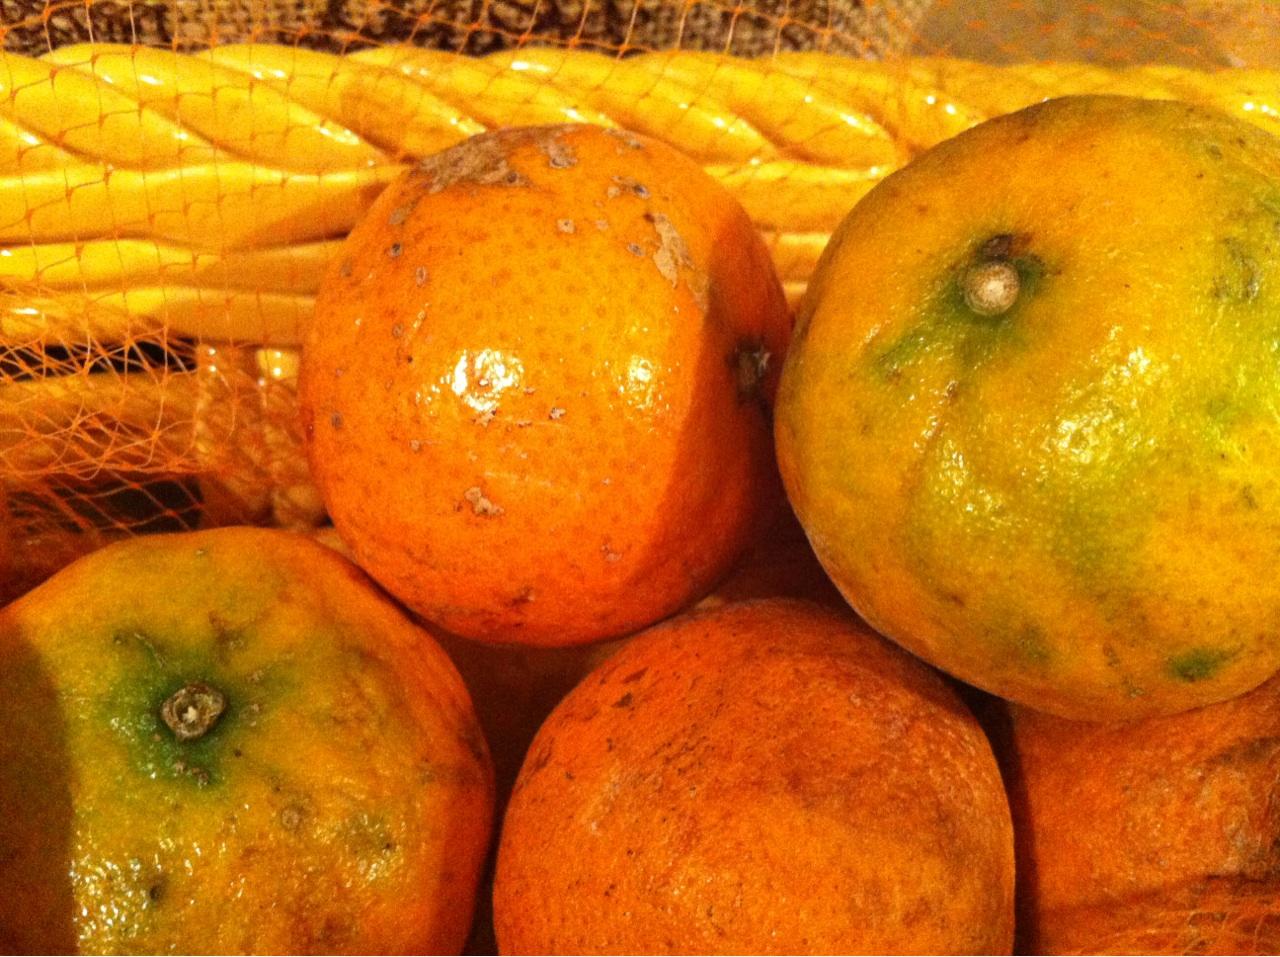 Orange fruit copyright free image